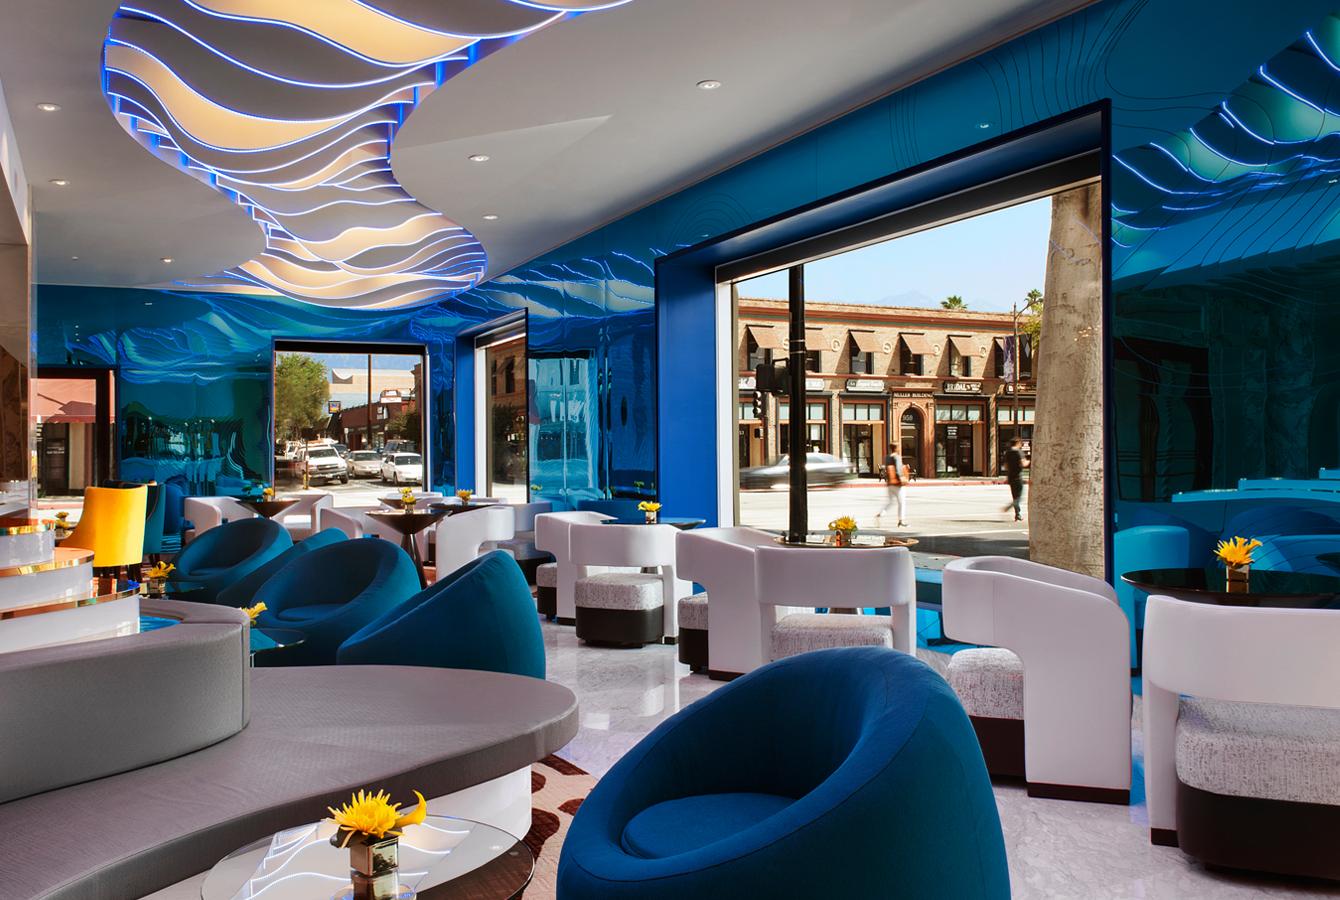 Hotel constance dusitd2 pasadena us dusitd2 constance for Hotel design group